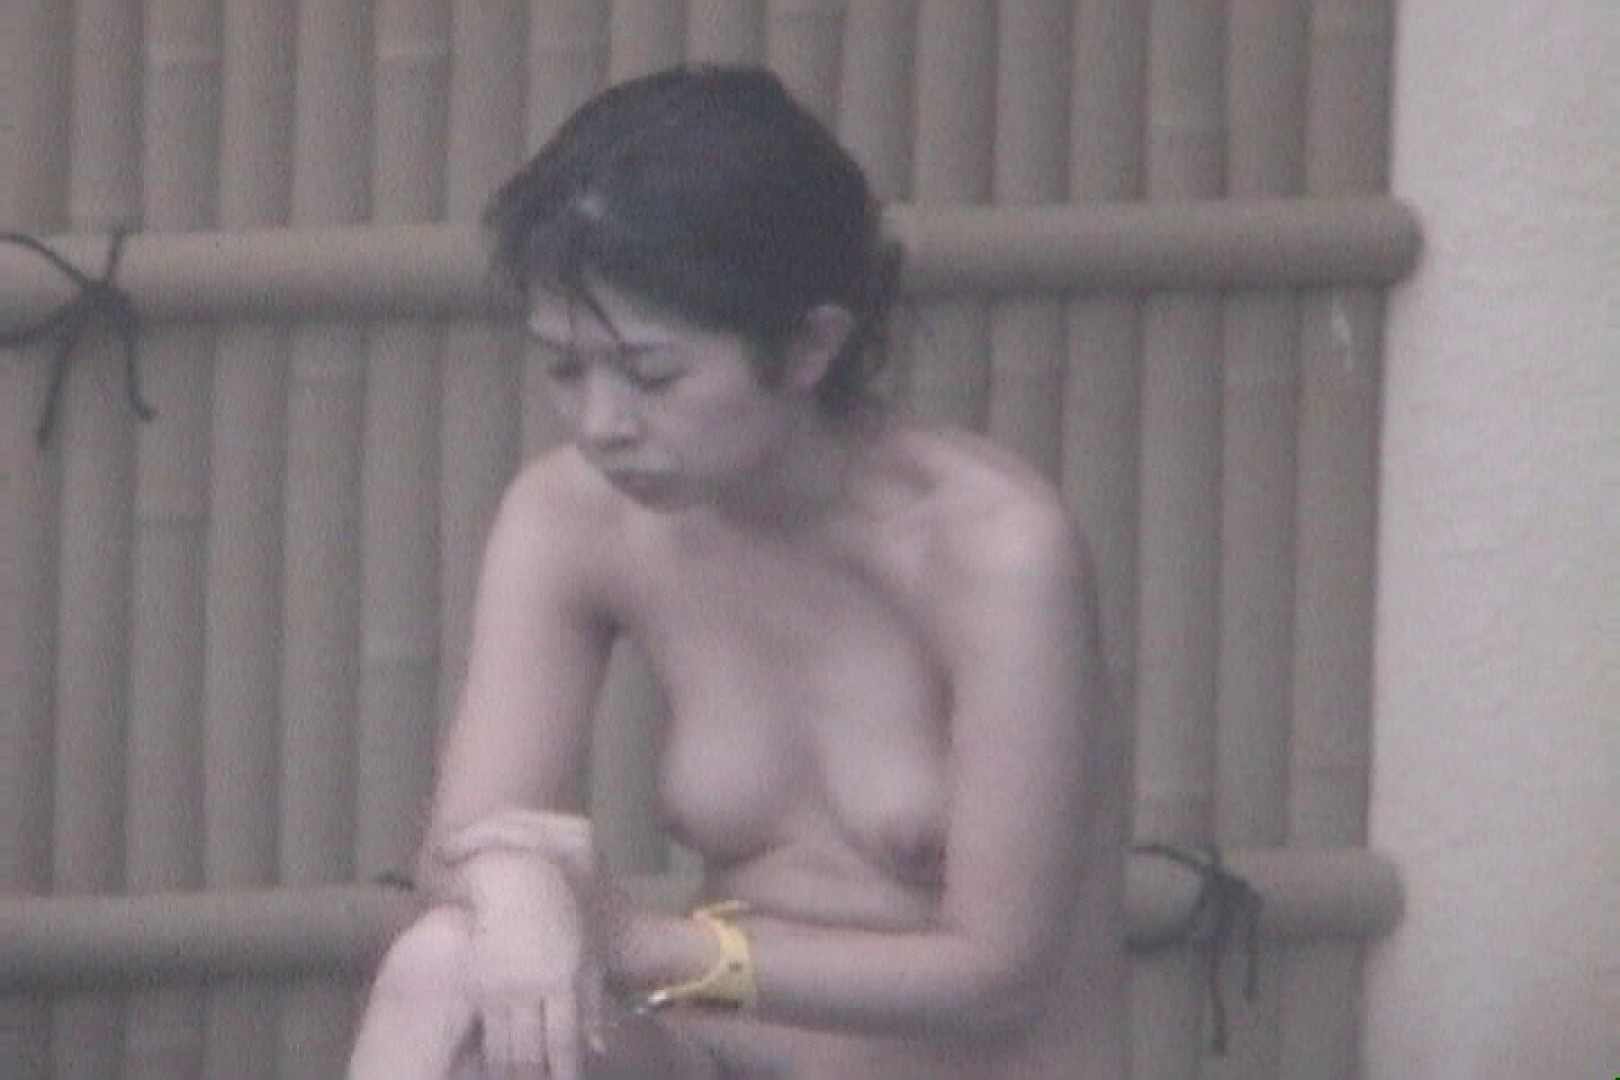 Aquaな露天風呂Vol.82【VIP限定】 露天   盗撮特撮  11pic 7